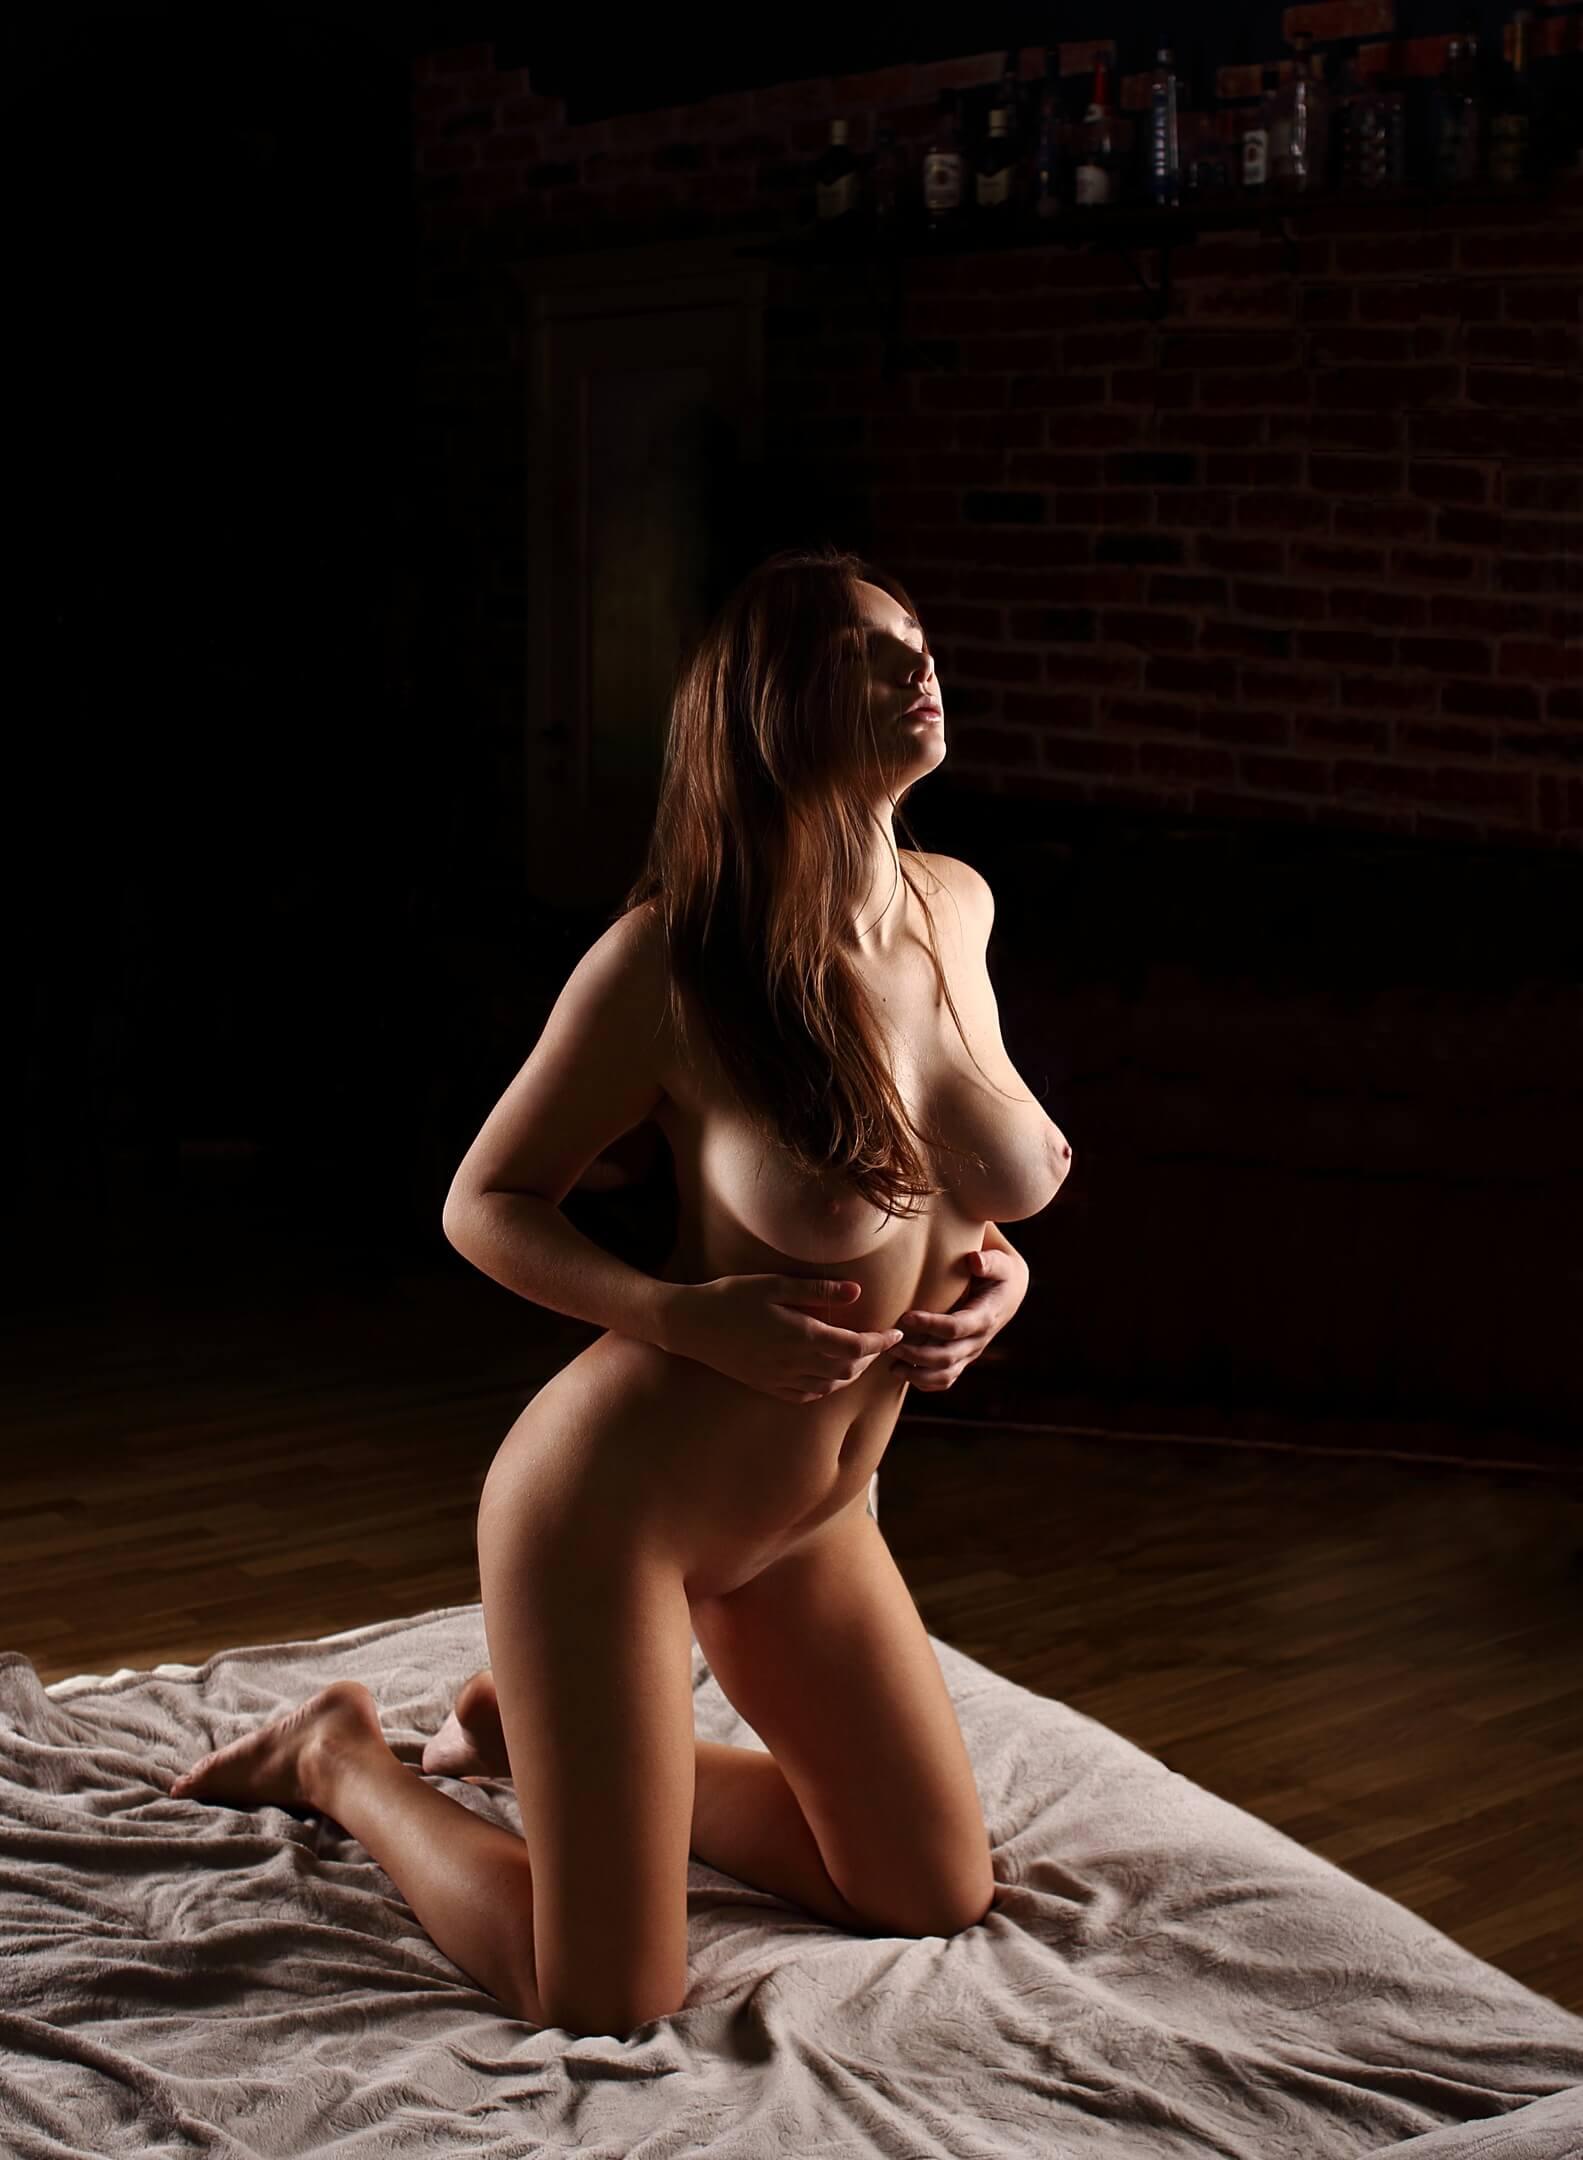 Nude model Natali Tihomirova in hot photo shoots ...